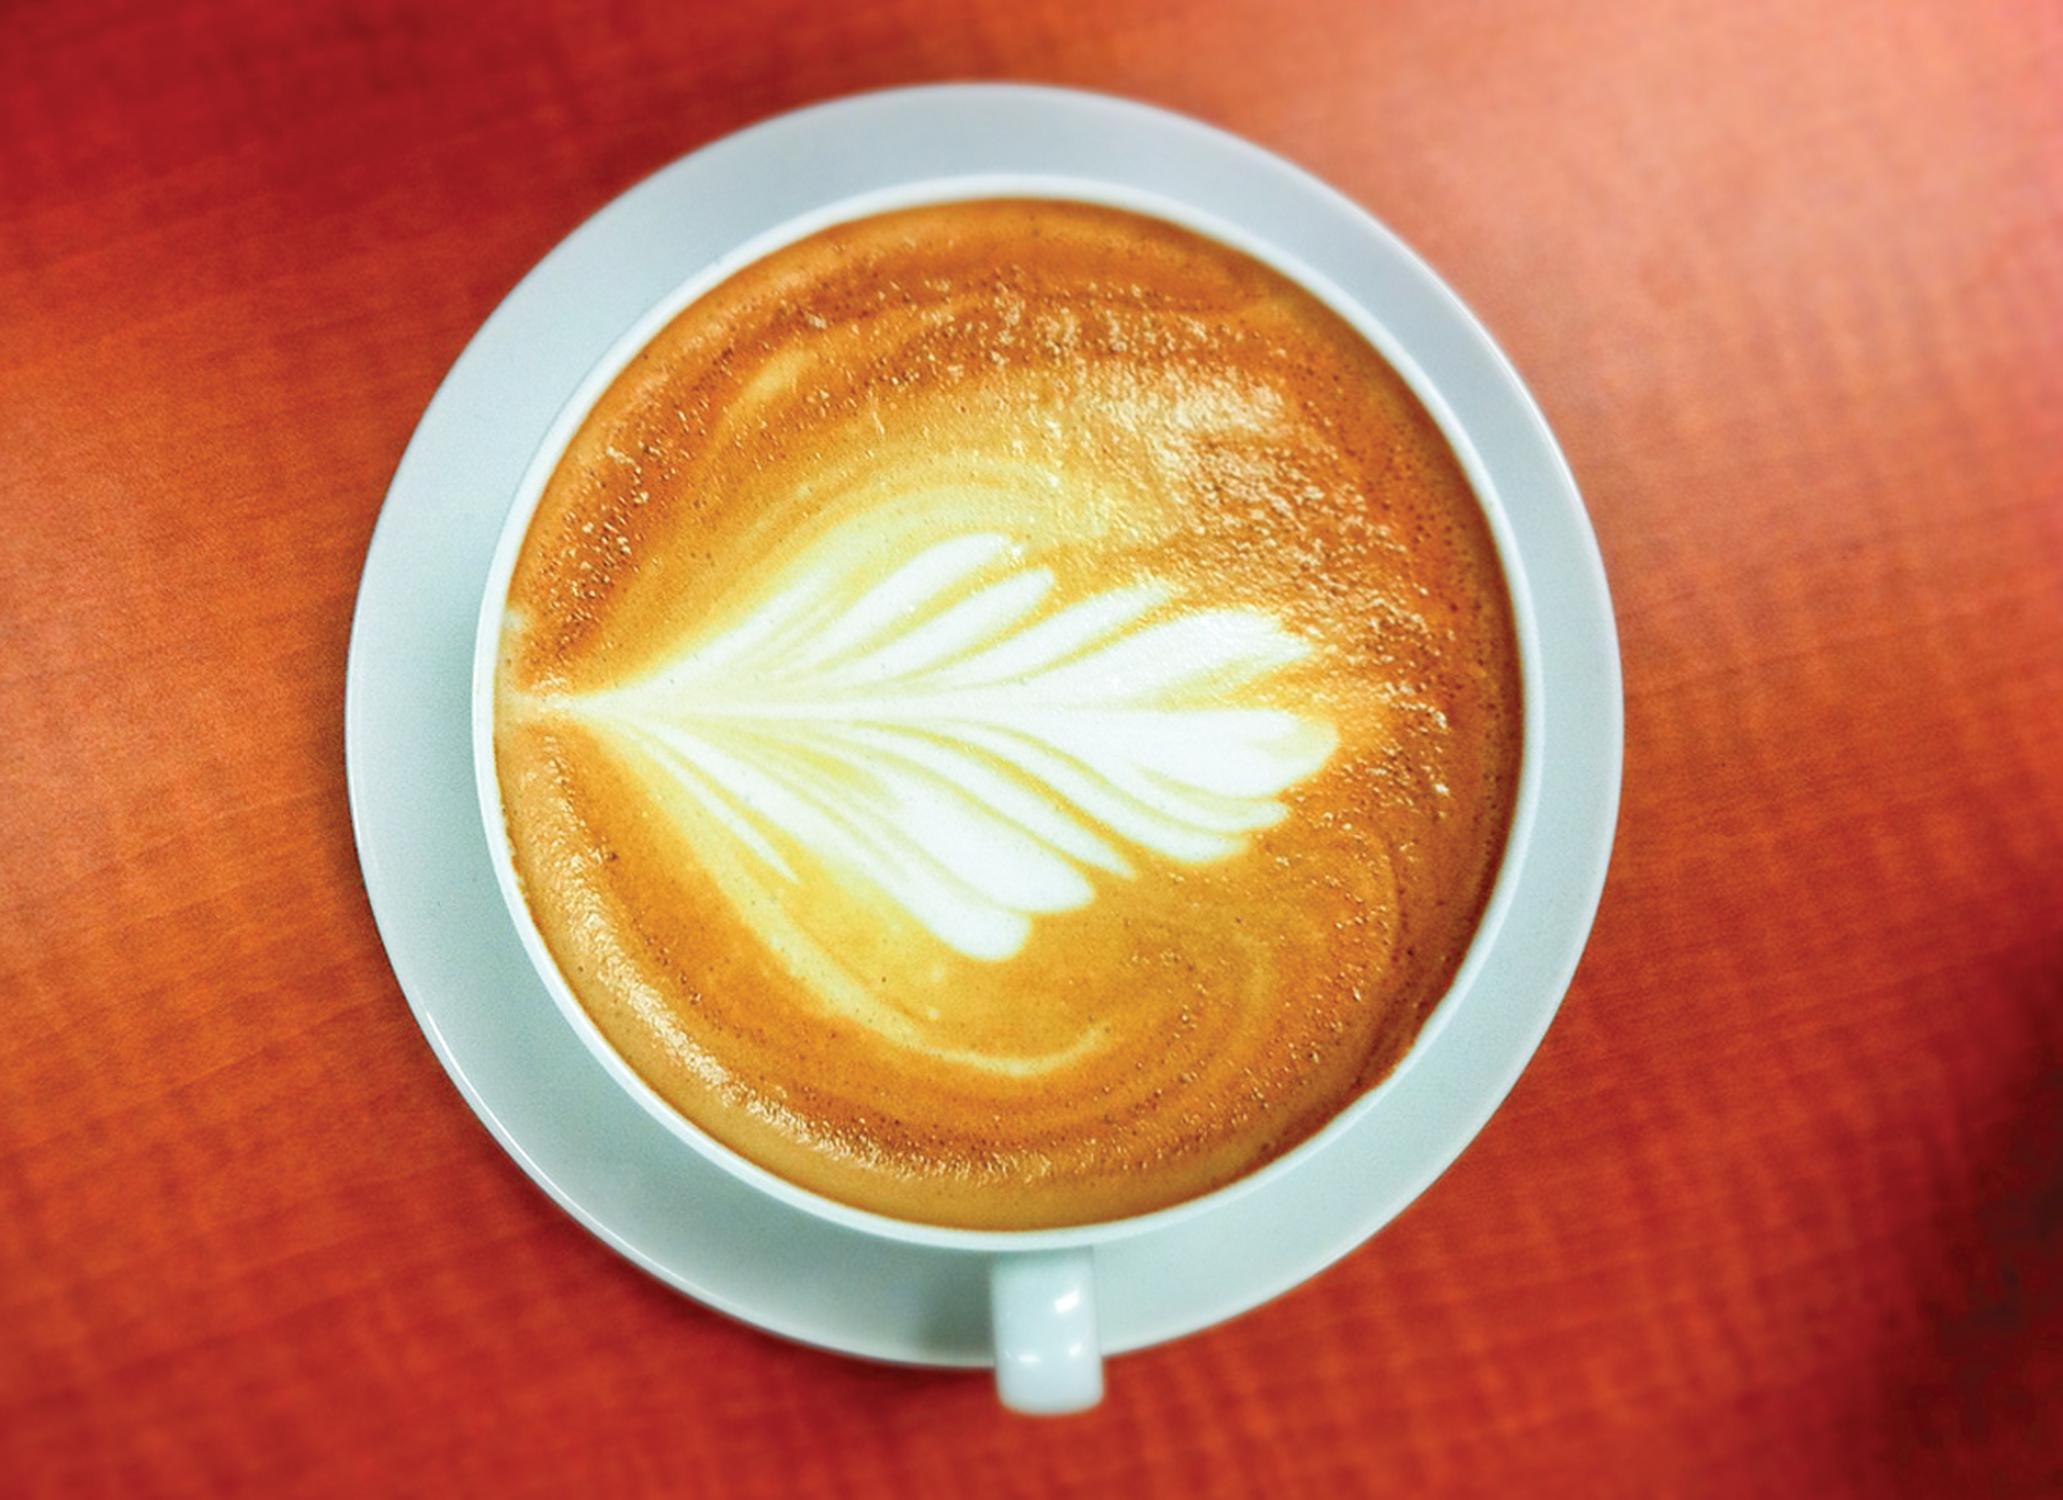 web_ac_coffee_recipes_cred_ccjerome_paz